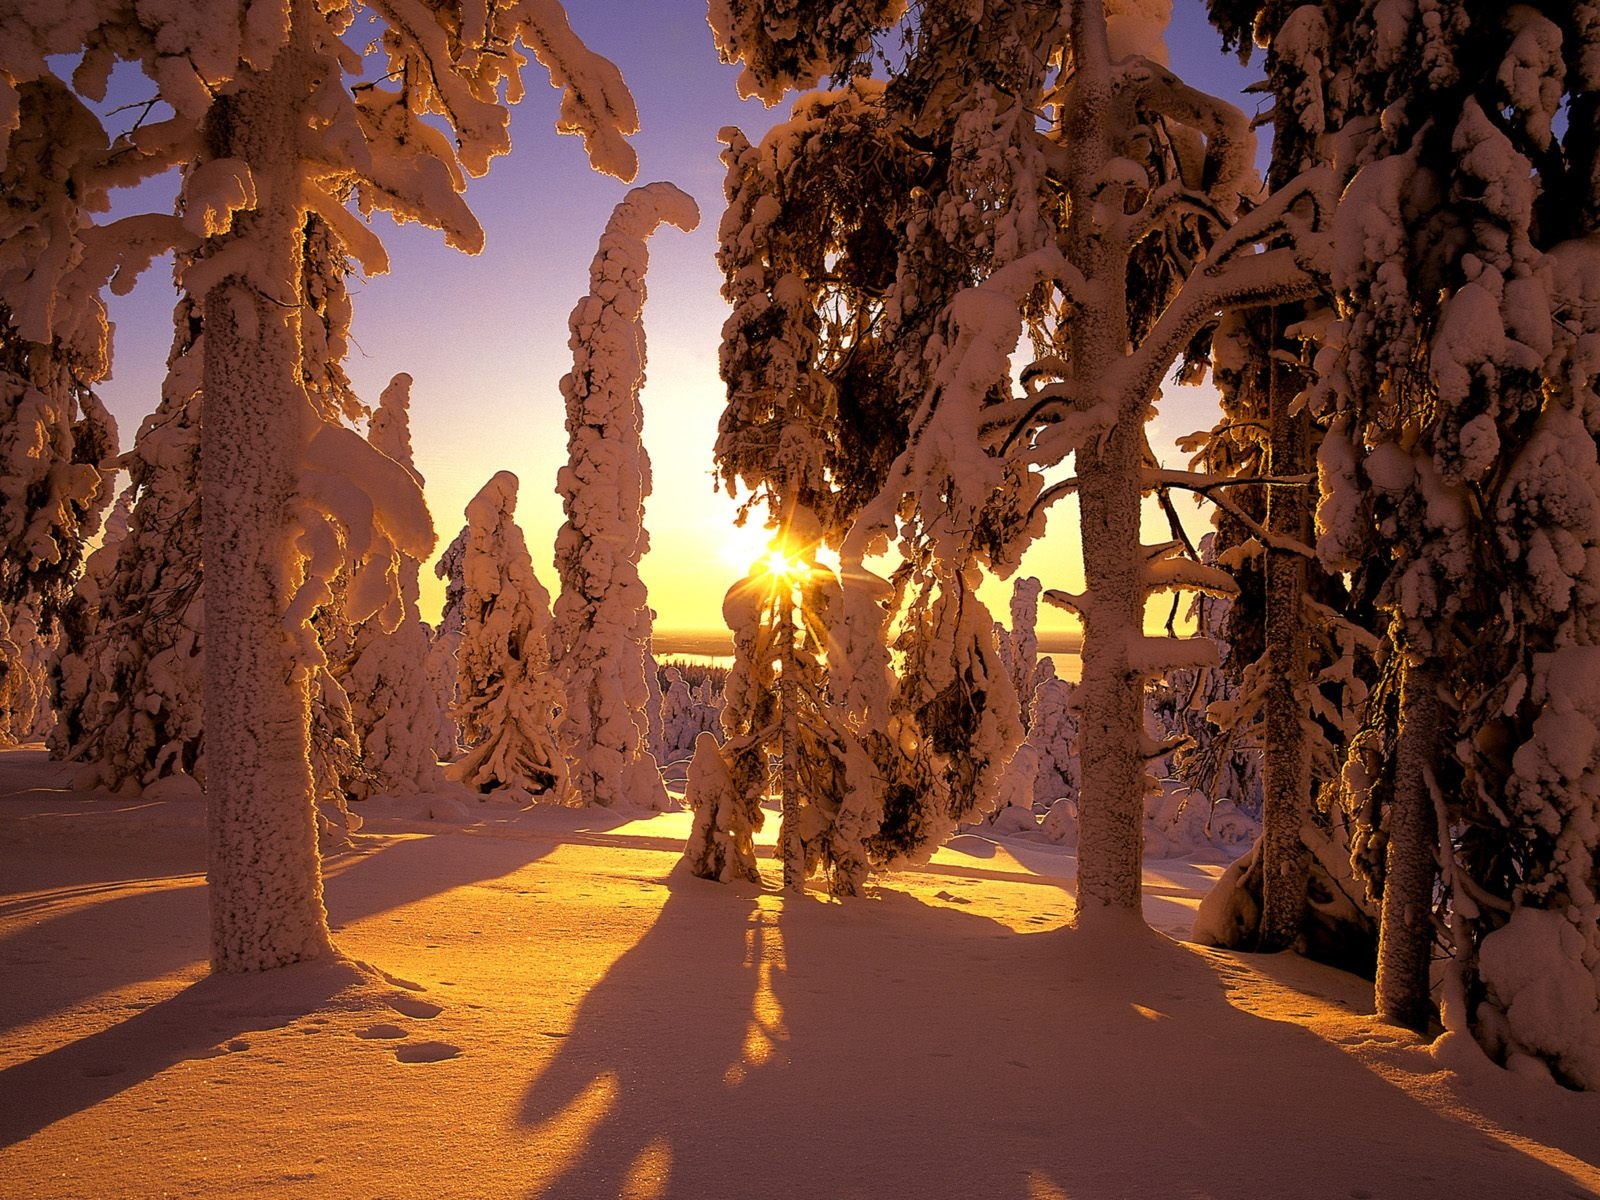 Zimski ugođaj :) - Page 4 The-best-top-winter-desktop-wallpapers-5